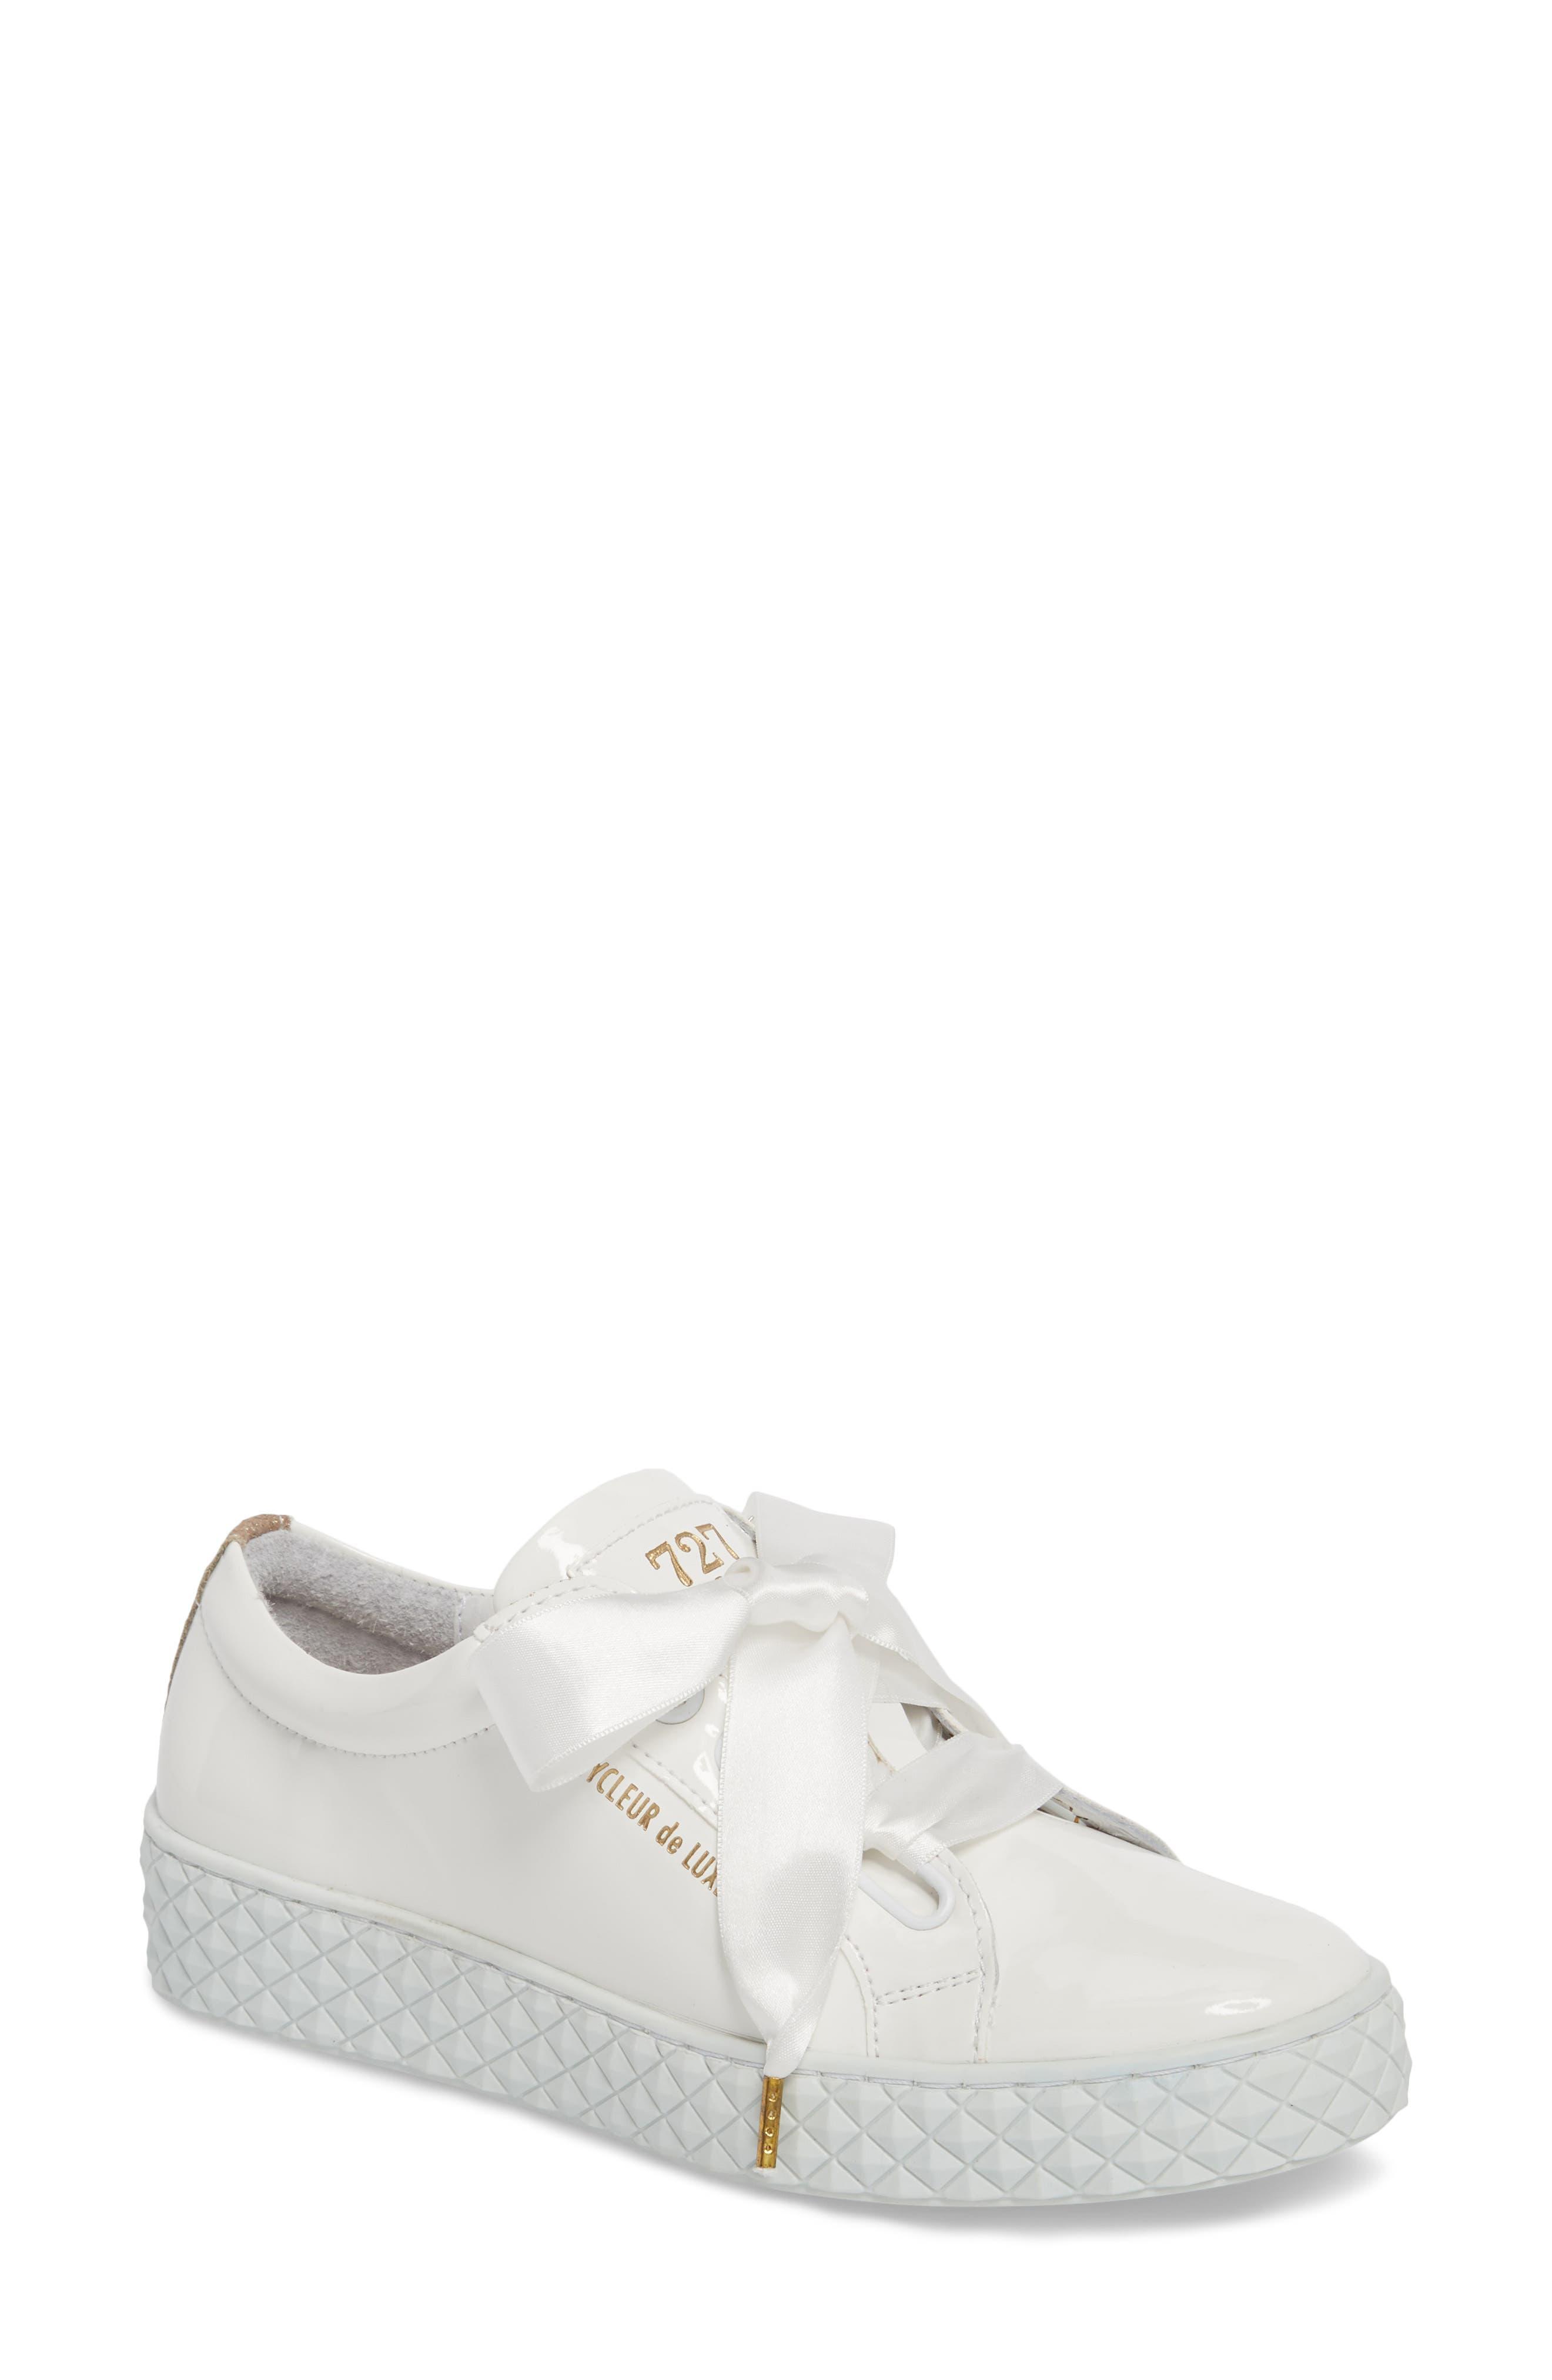 Acton Sneaker,                         Main,                         color, White Patent